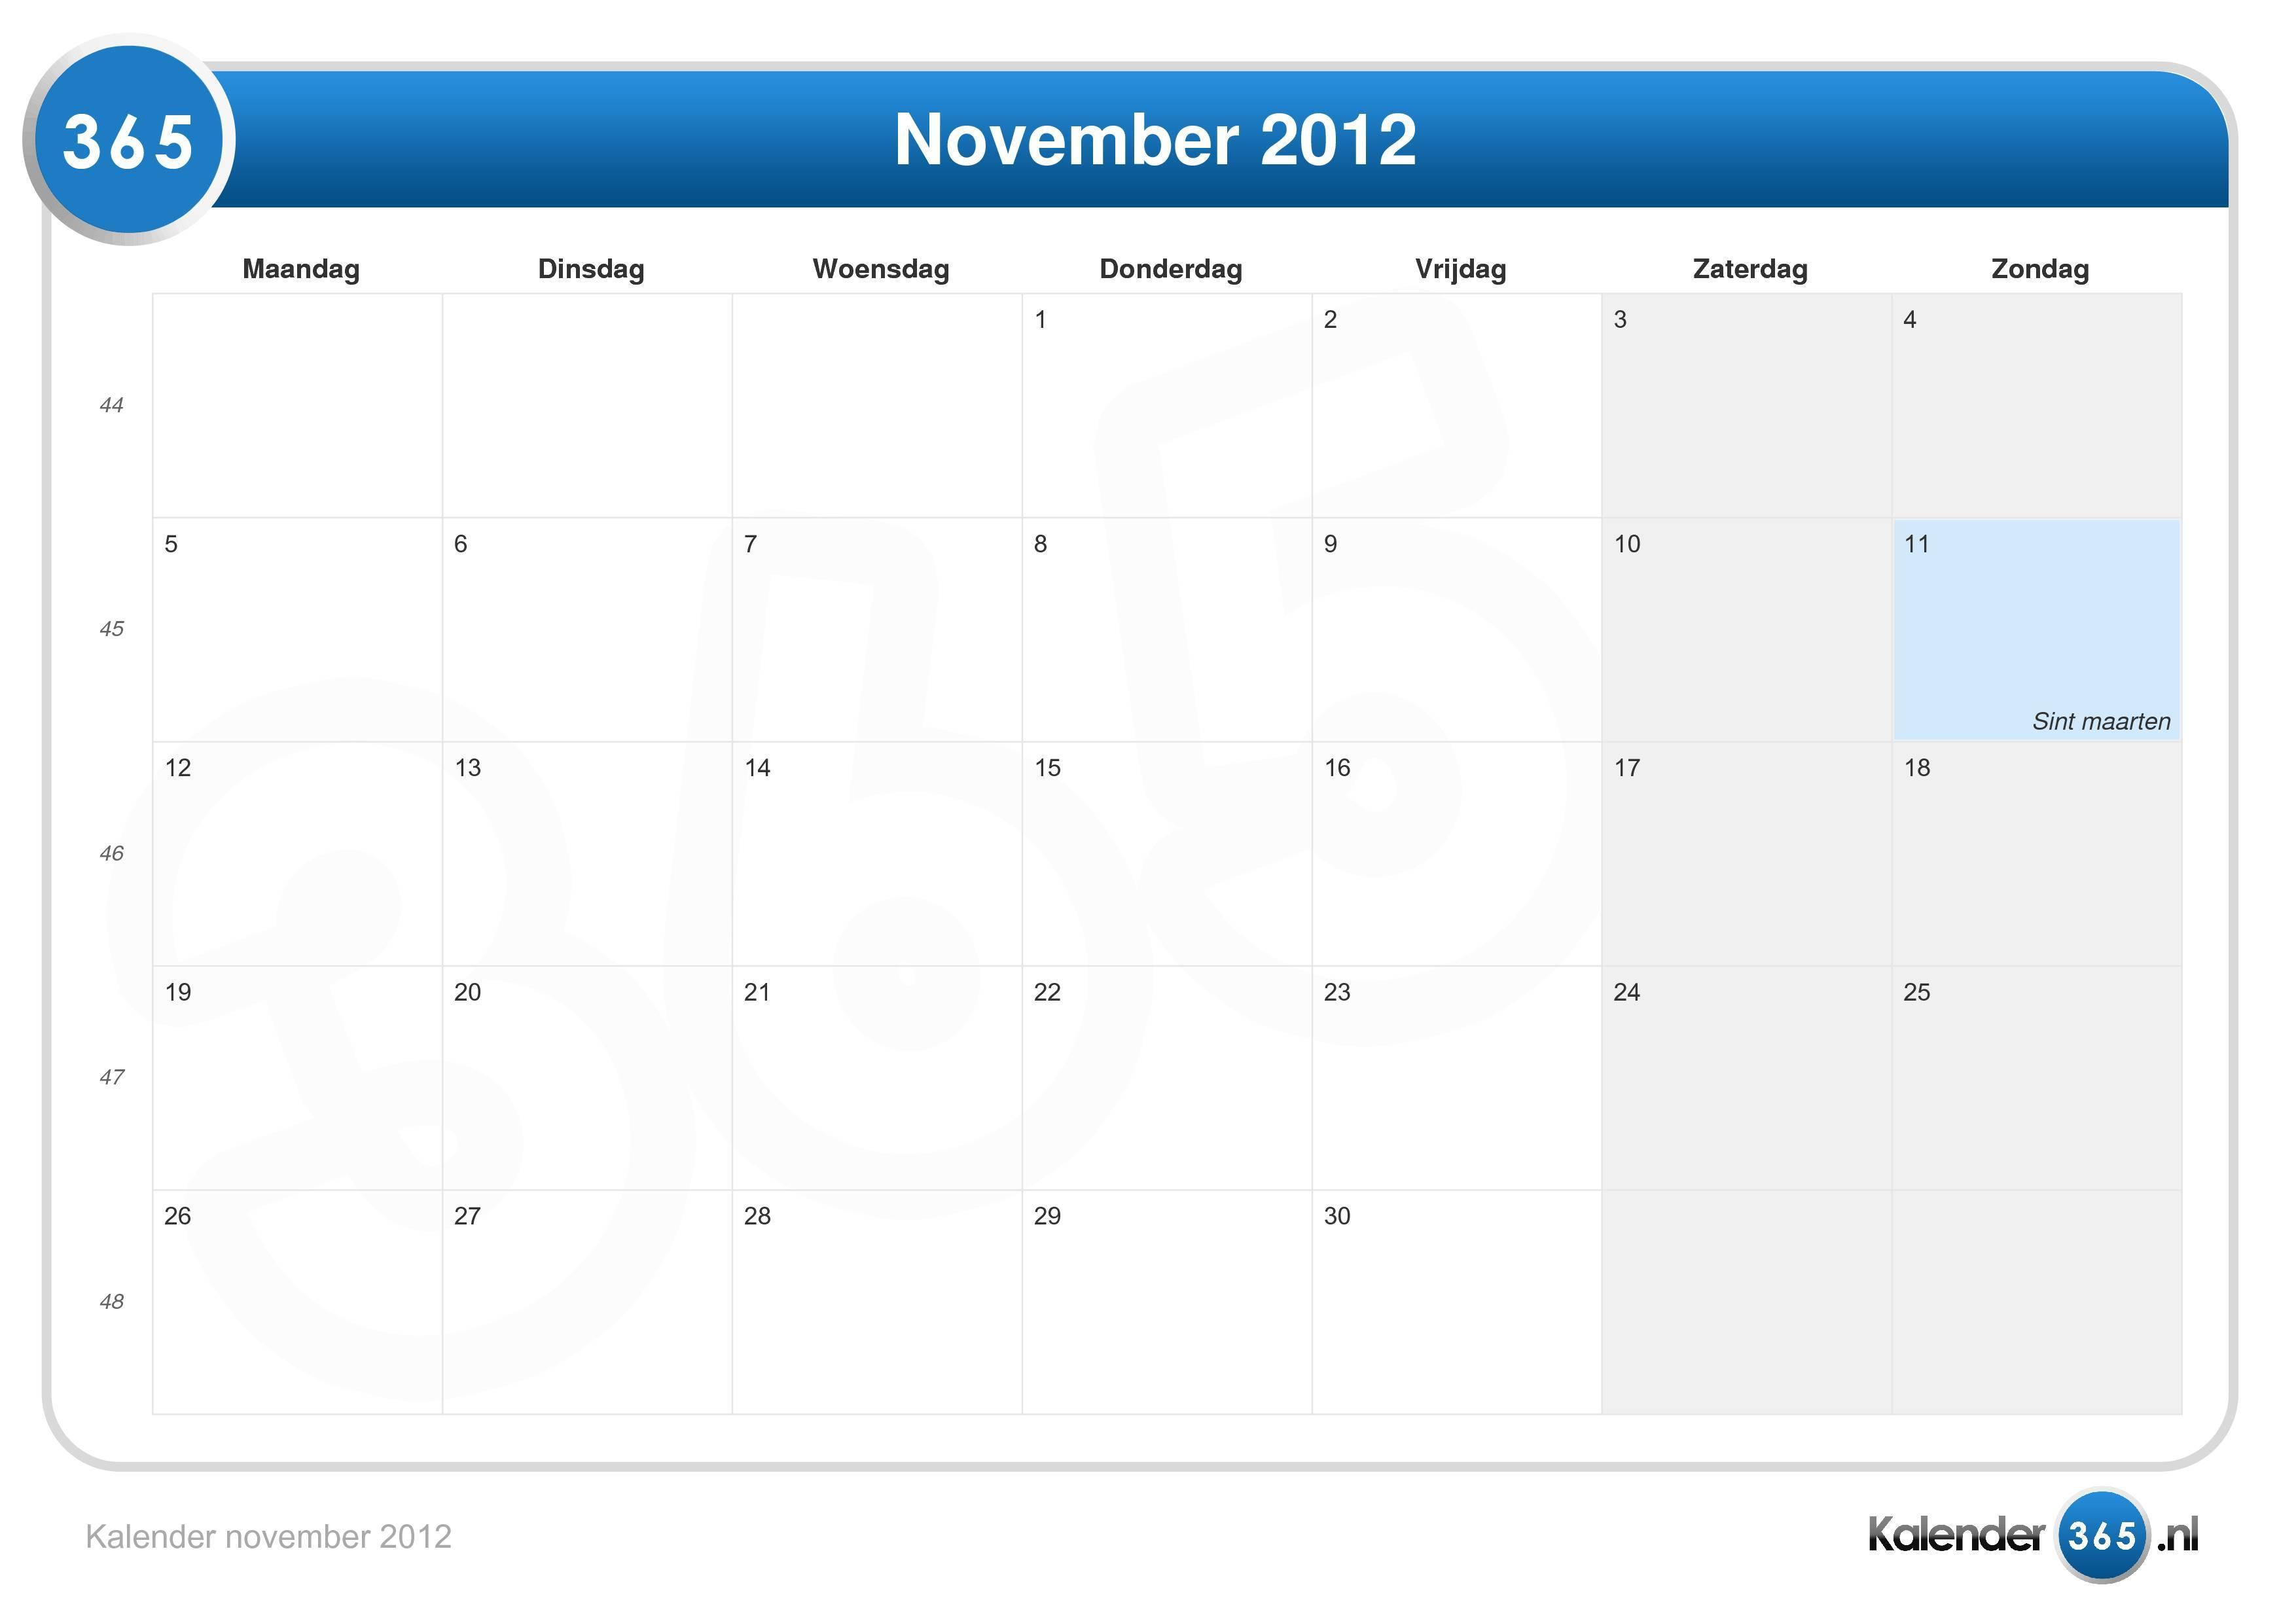 Kalender november 2012